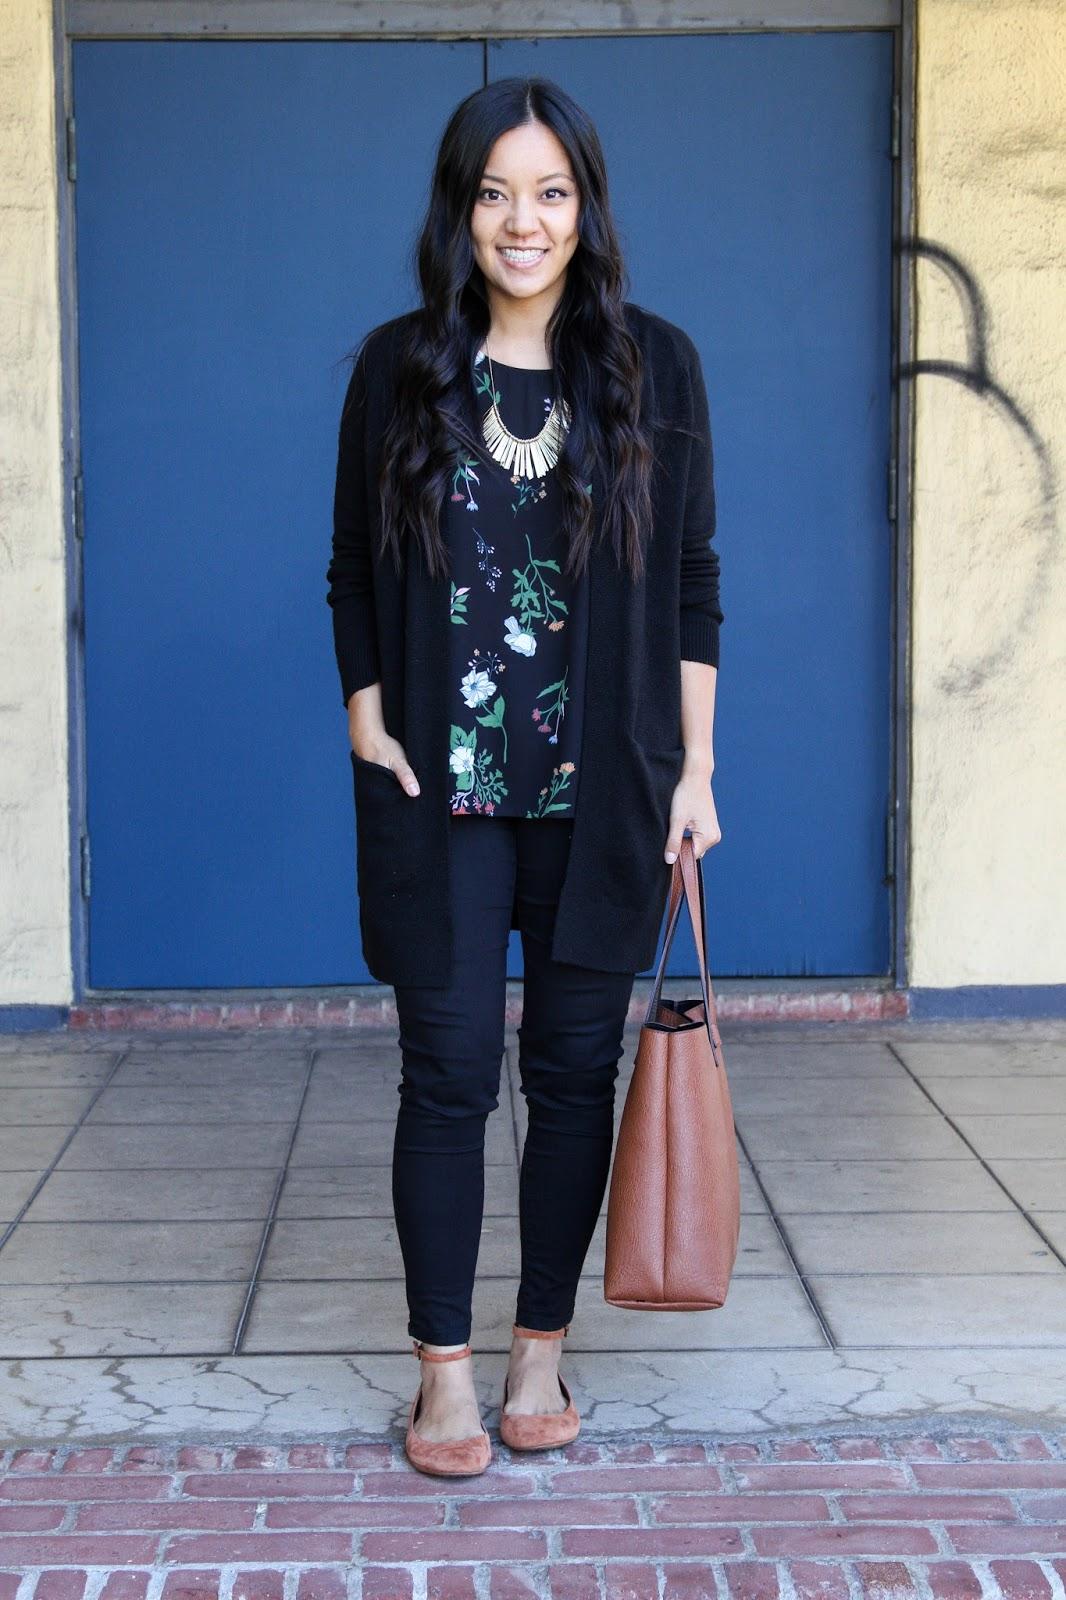 Floral Shirt + Black Cardigan + Black Skinnies + Red Flats + Statement Necklace